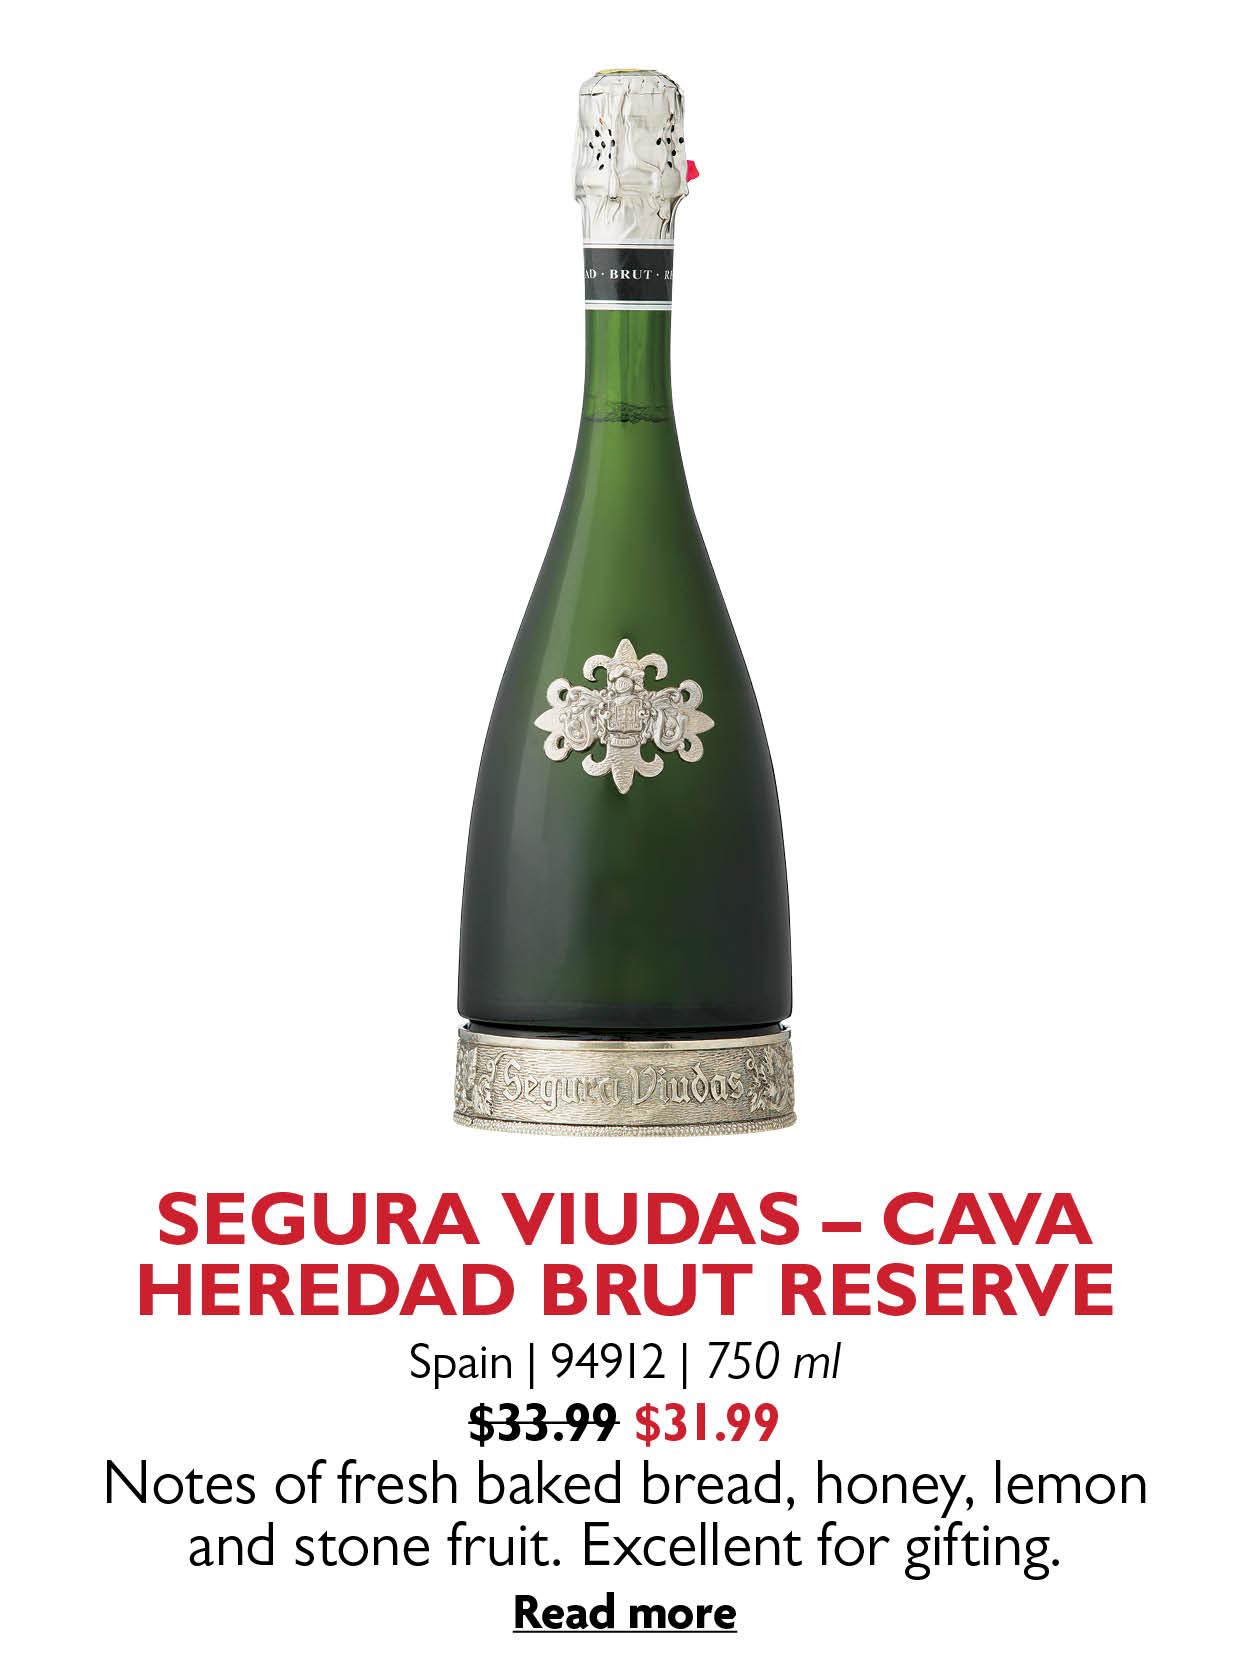 SEGURA VIUDAS - CAVA HEREDAD BRUT RESERVE